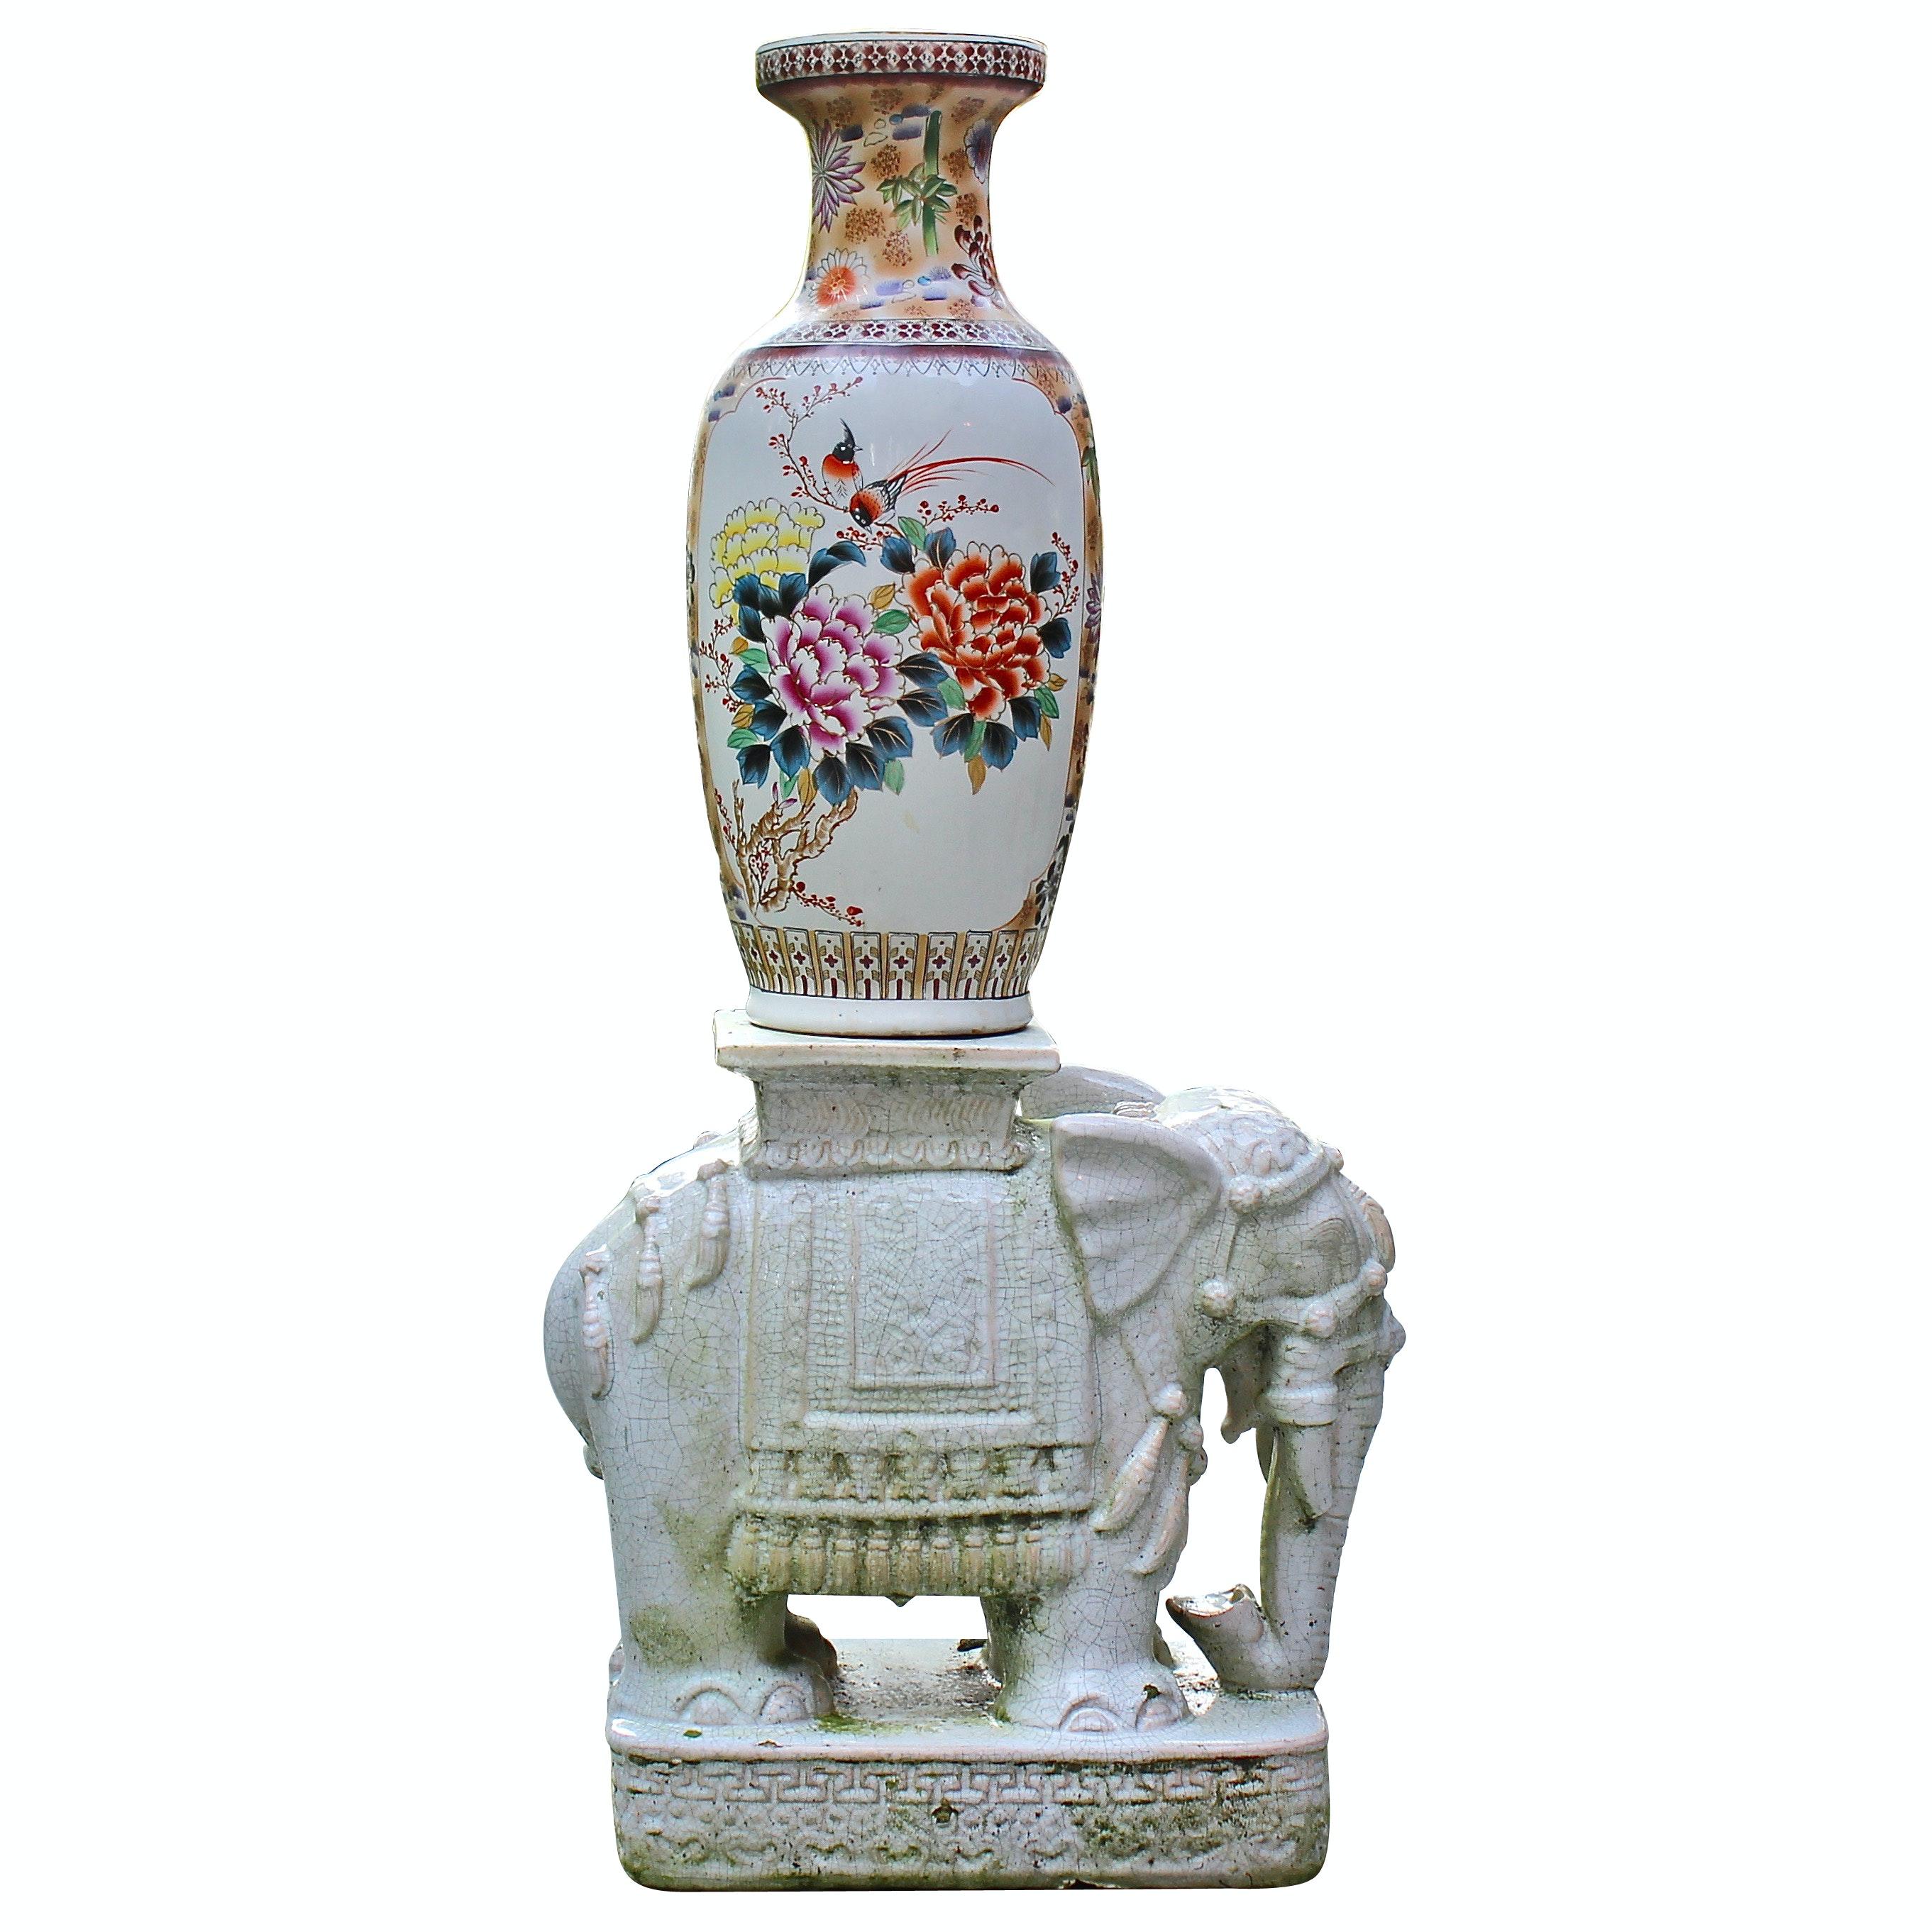 Vietnamese Elephant Garden Sitting Bench with Chinese Porcelain Vase